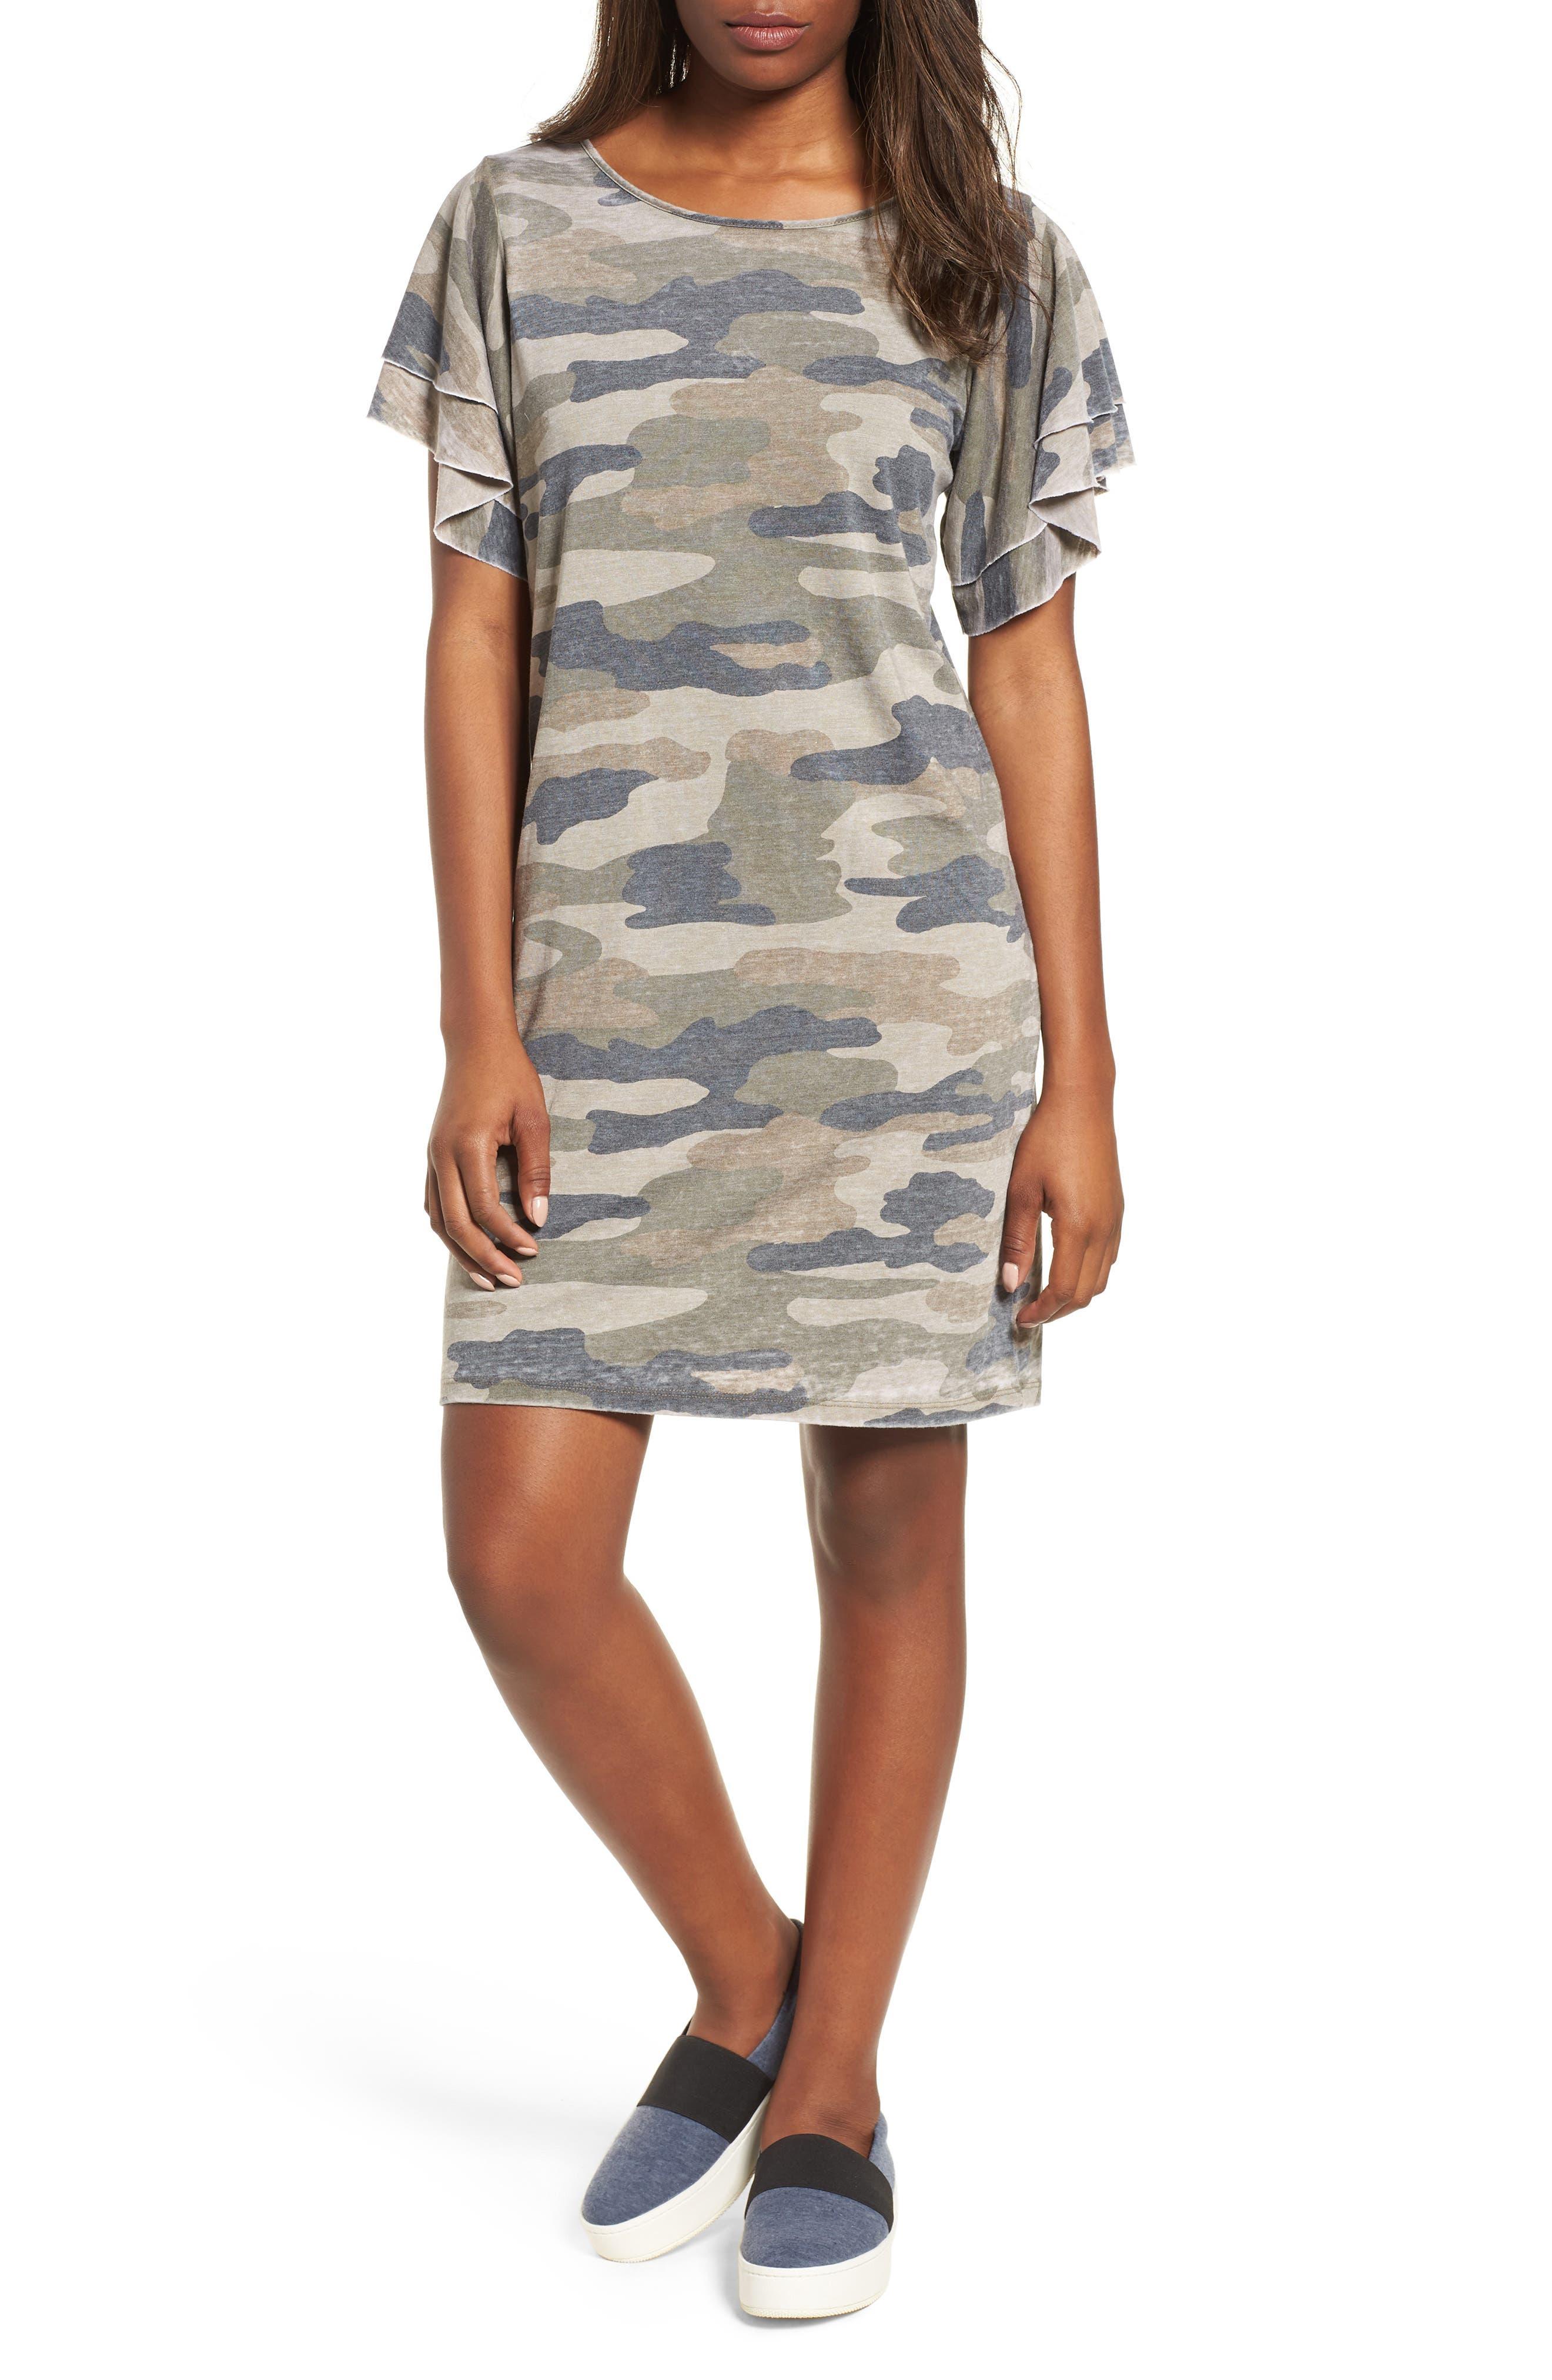 Lucky Brand Camo Print Dress